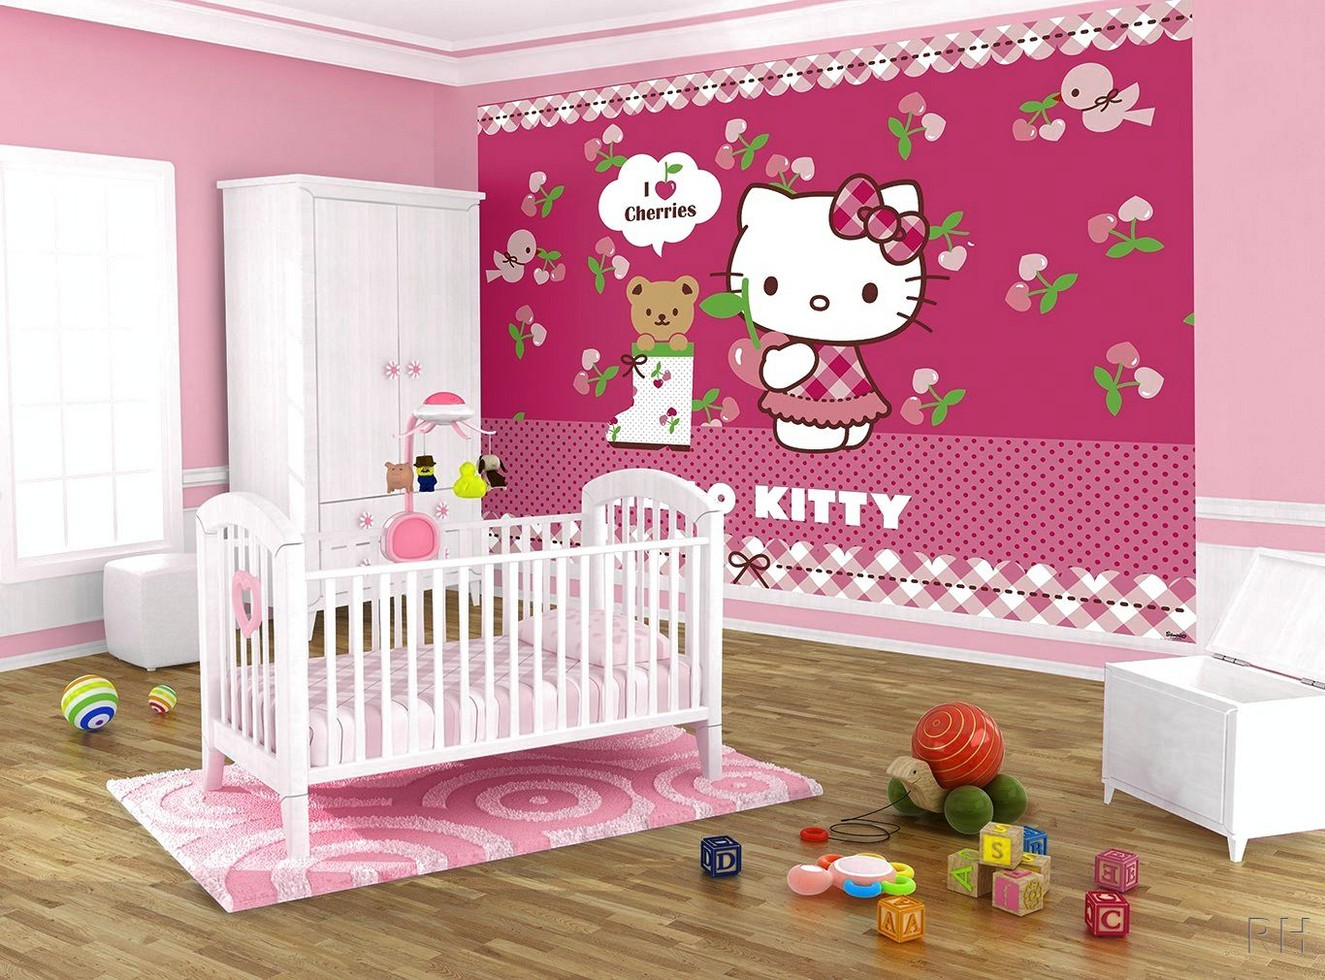 Creating A Cute Hello Kitty Bedroom Photo Boys Blue Nursery Ideas 1325x980 Wallpaper Teahub Io